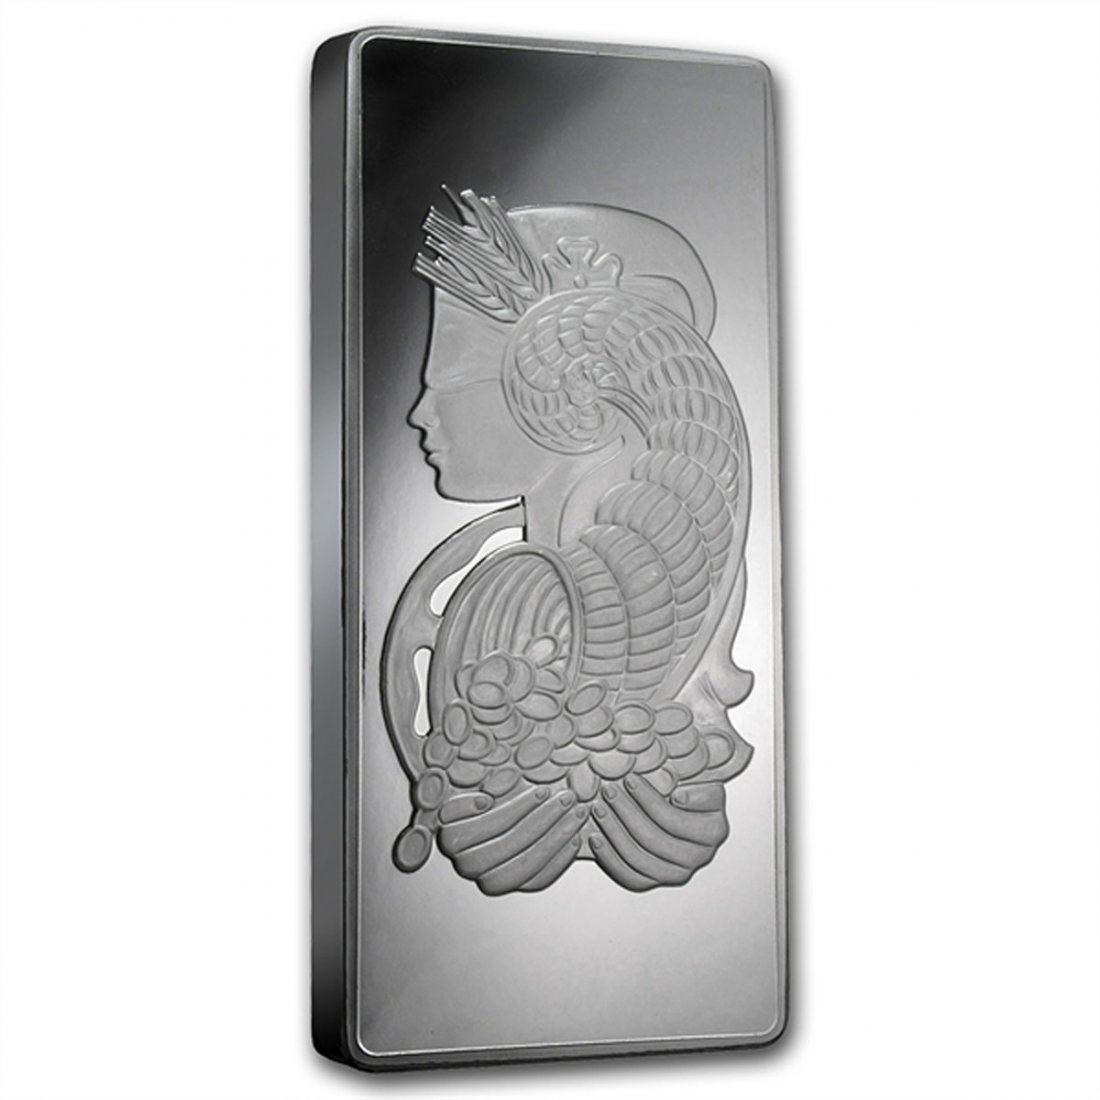 500 gram Pamp Suisse Silver Bar - Fortuna (1/2 kilo)